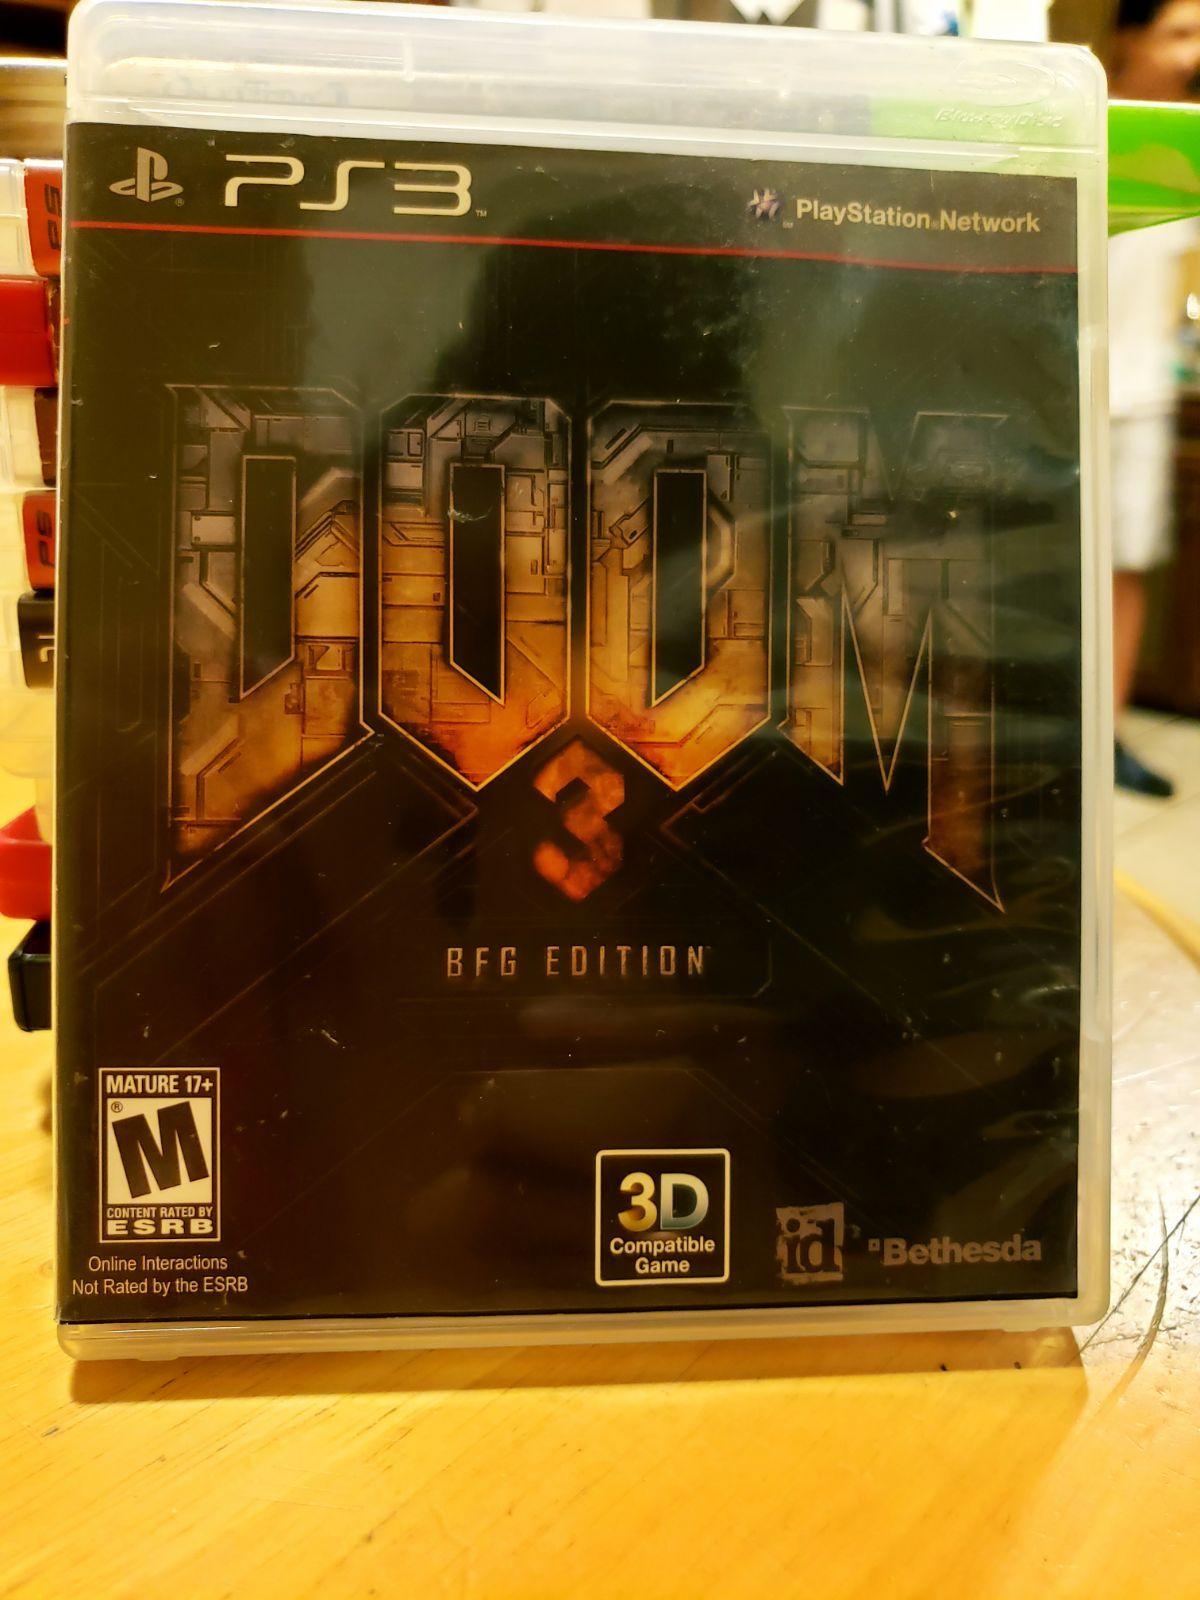 961c3e0f4cbe60458dc356c2249ec161 - How To Get Doom 3 To Work On Windows 10